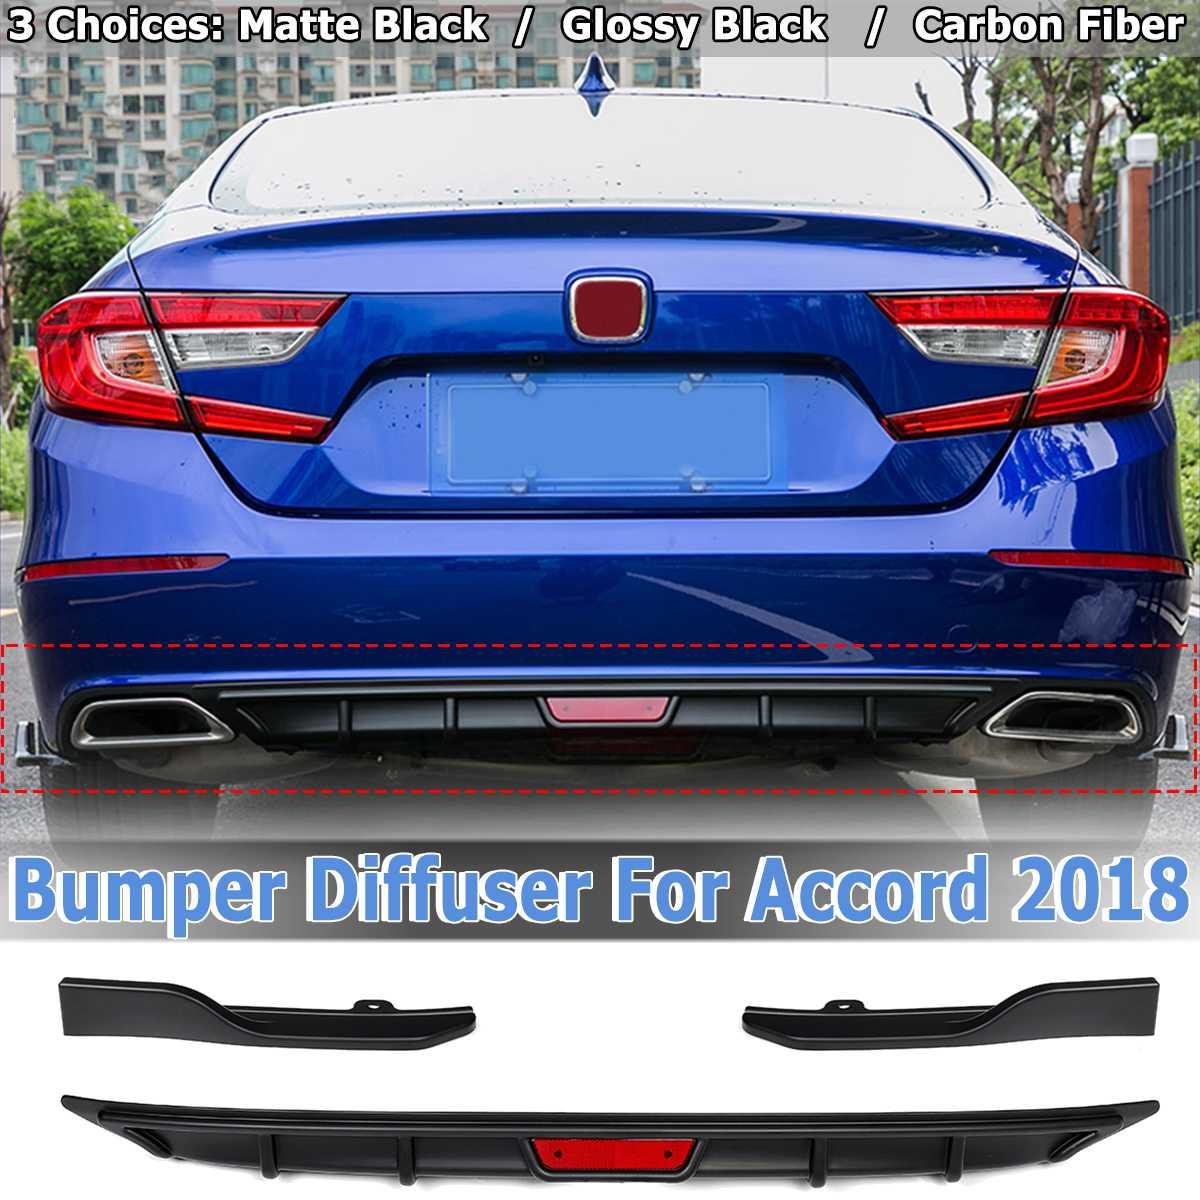 3PCS Rear Bumper Chin Cover Lip Diffuser Side Spoiler Wing For Honda For Accord 2018 Matte Black/ Glossy Black/ Carbon Fiber